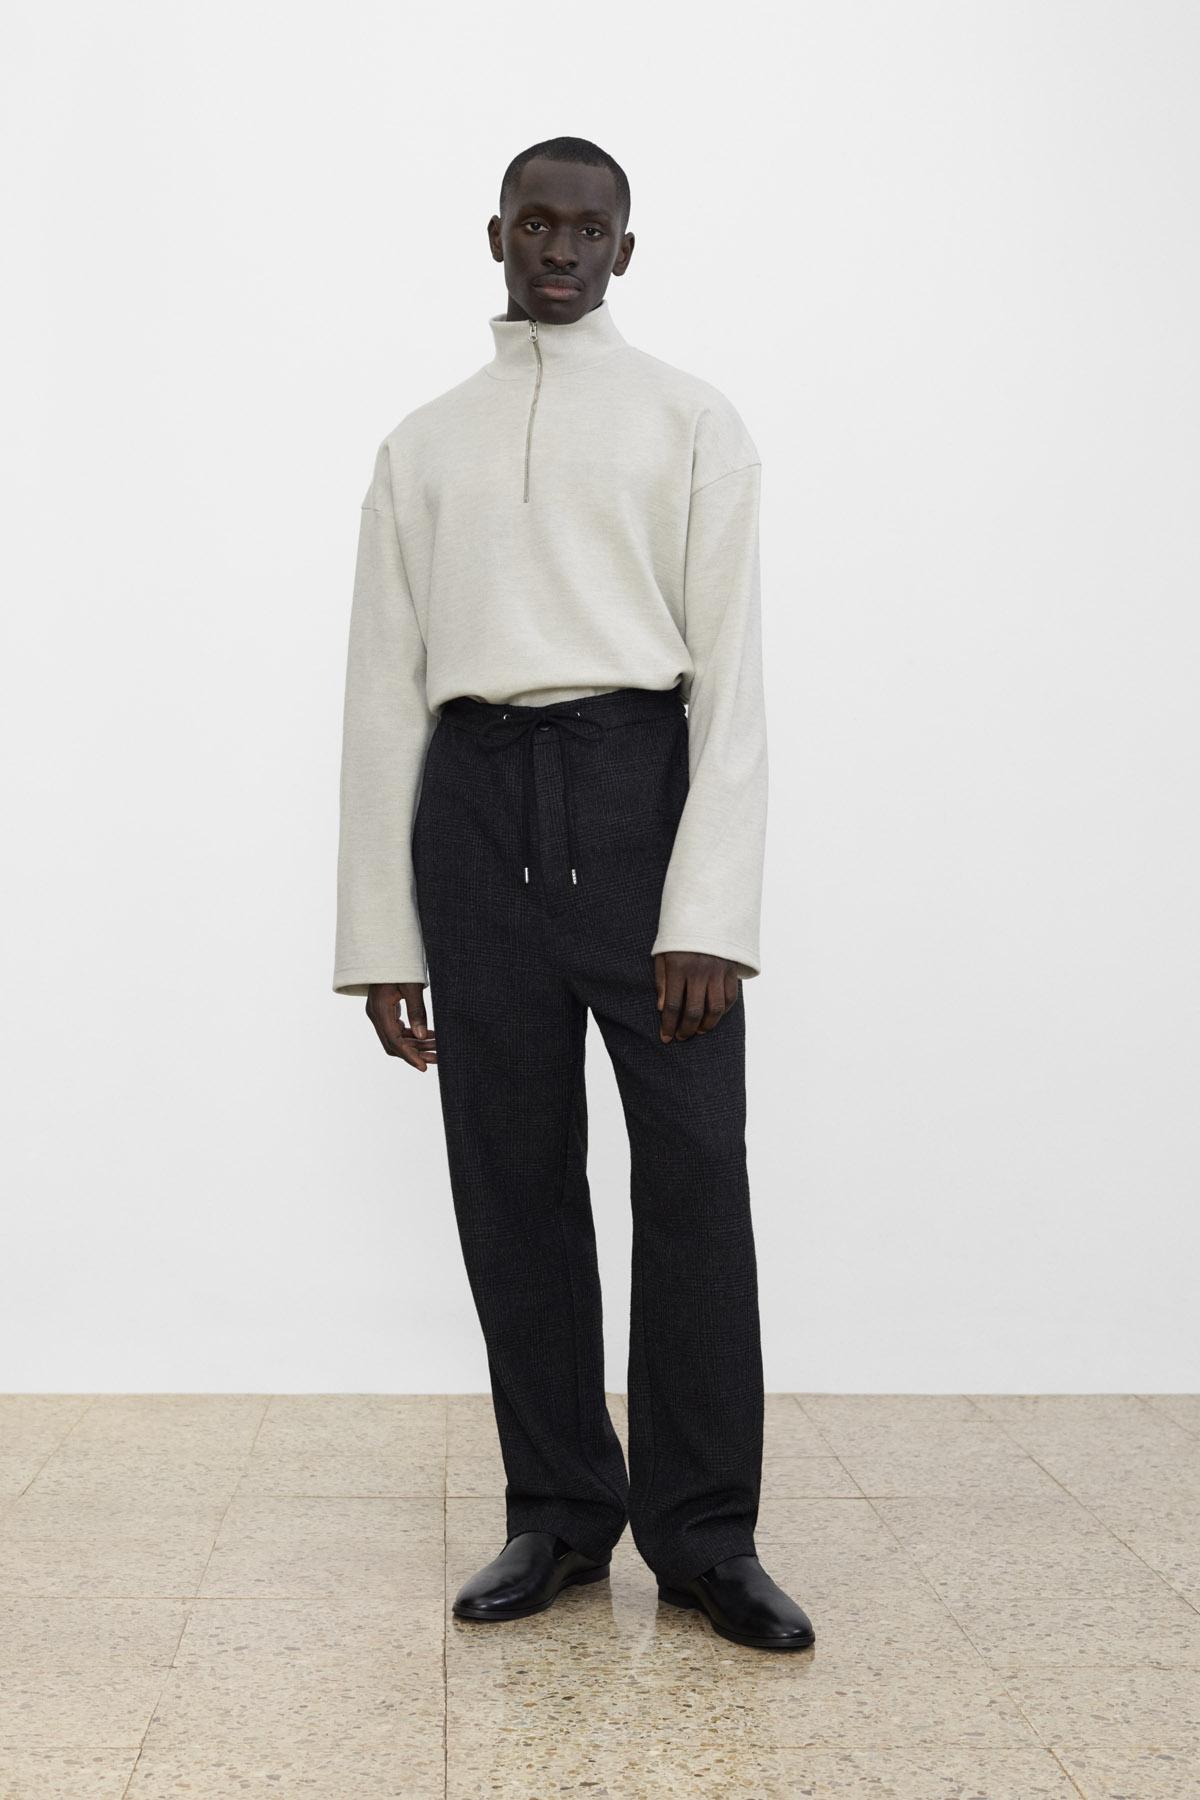 <b>8</b><br>Jasper Wool Jersey Top<br>Hakon Checked Wool Pants